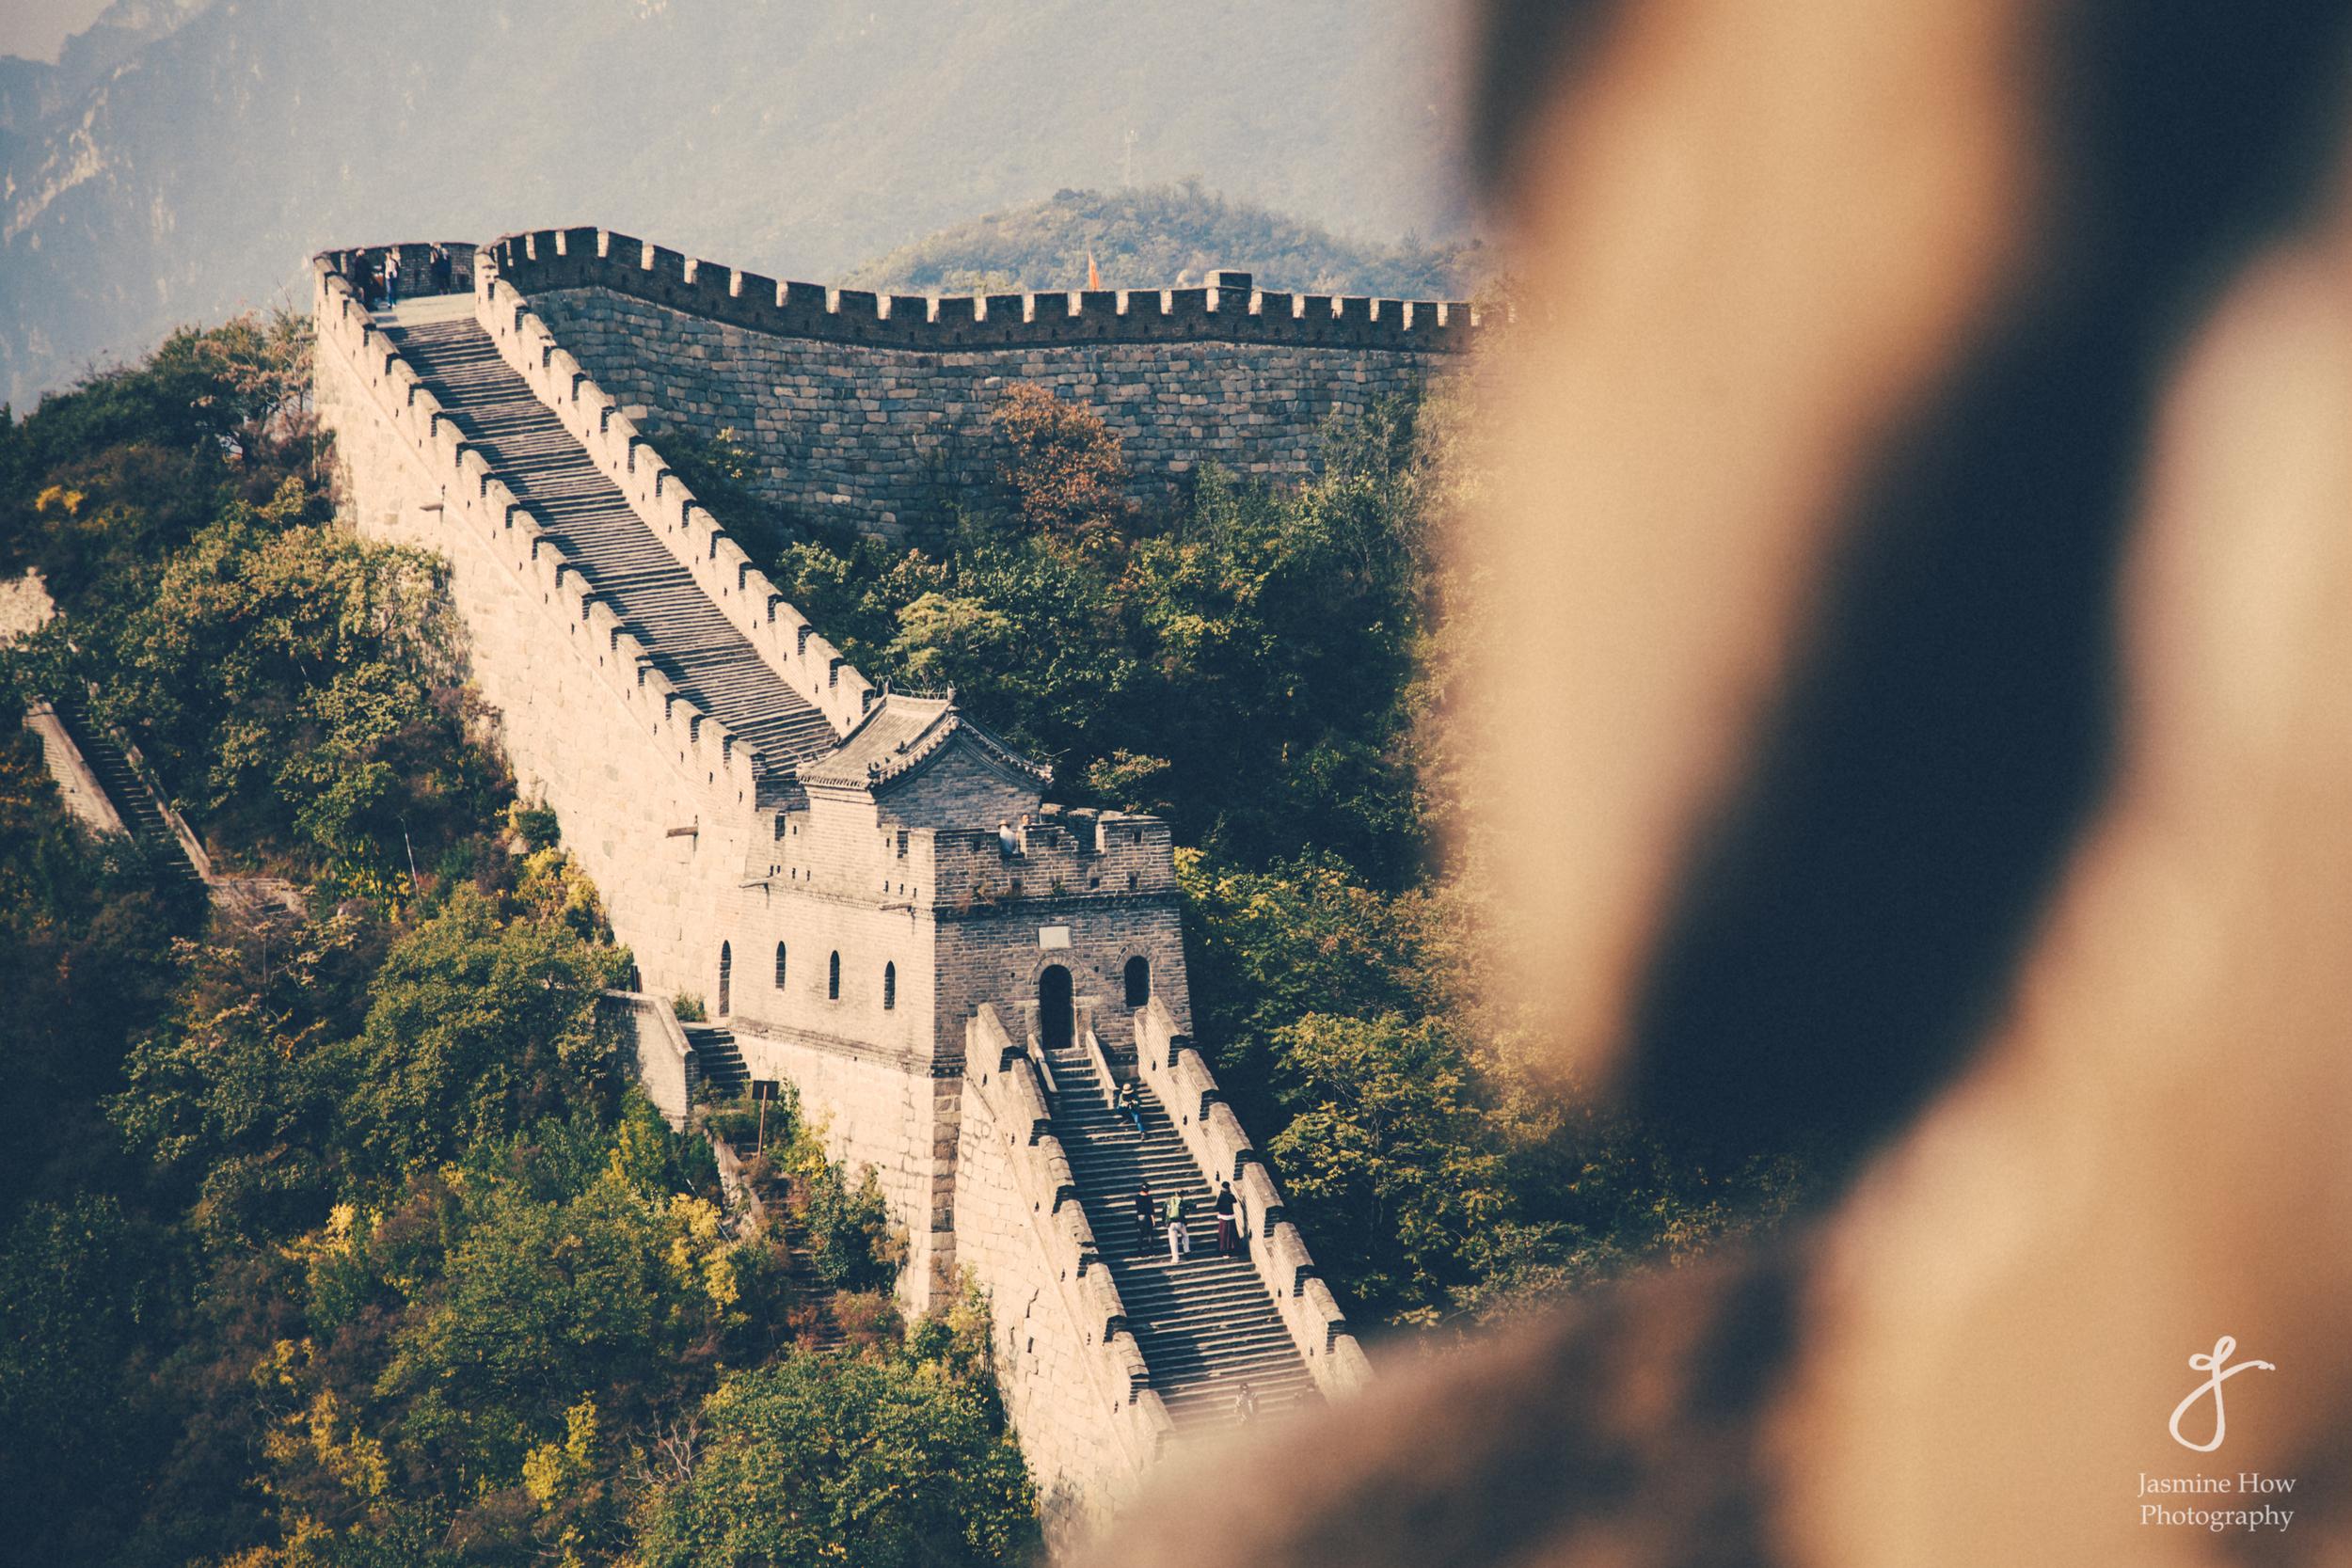 Beijing 2015 - 14 October - Mutianyu Great Wall - 056.jpg